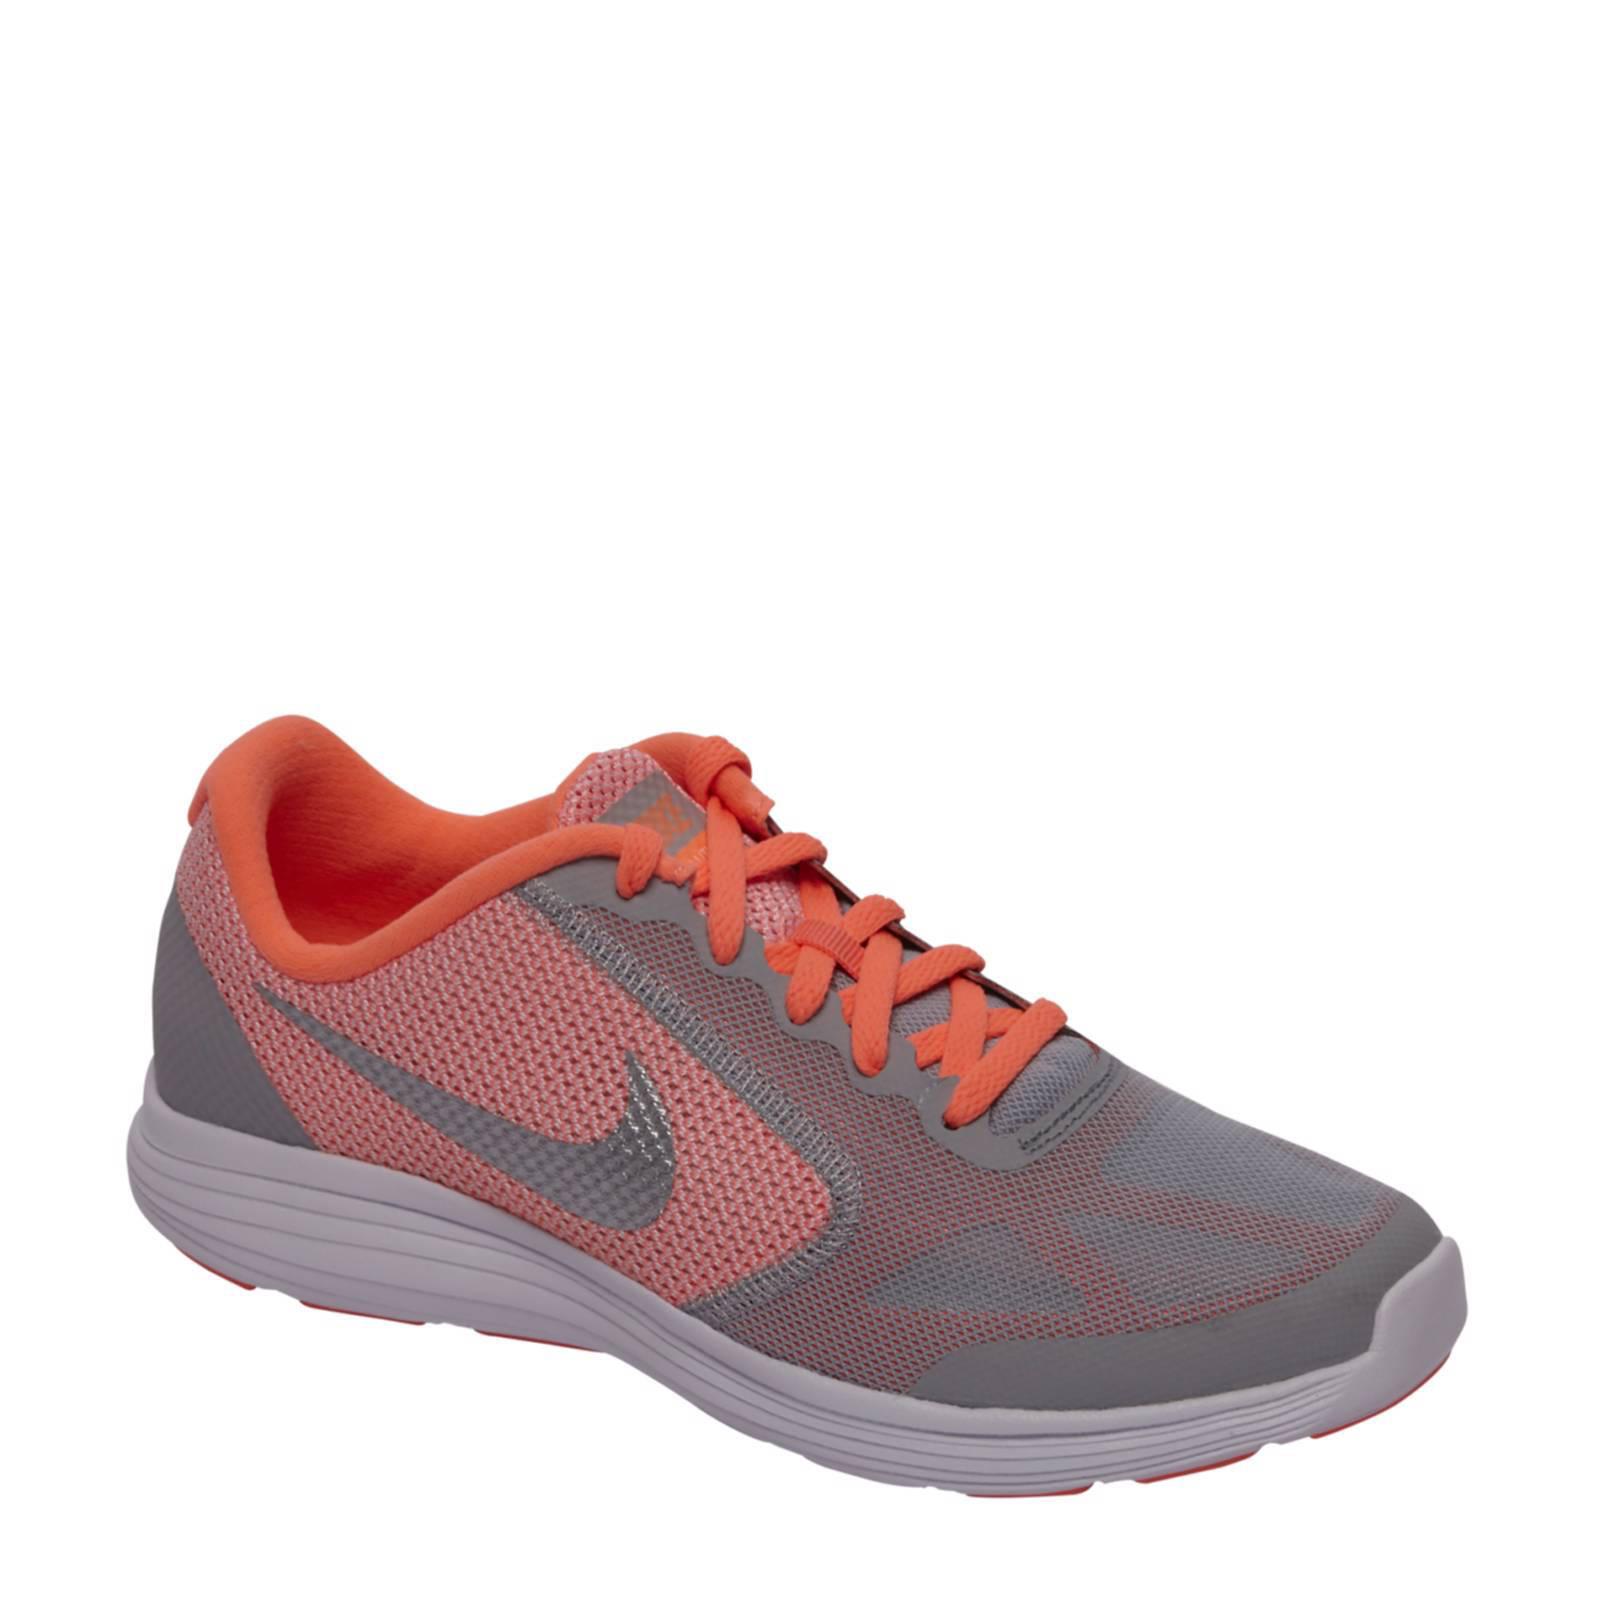 Revolution 3 sneakers